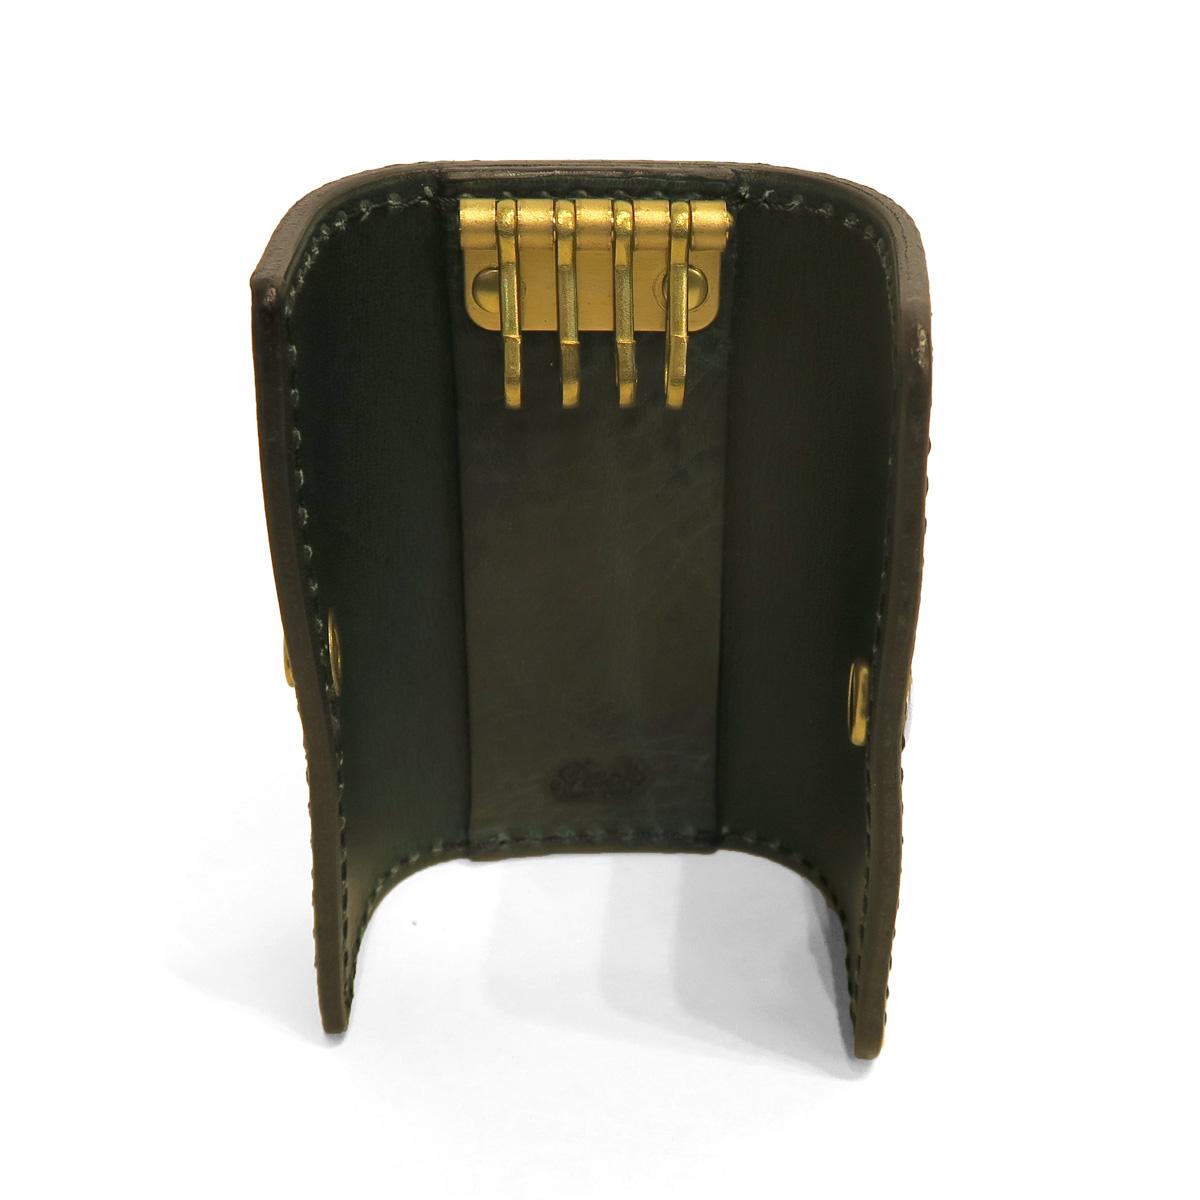 KE-501